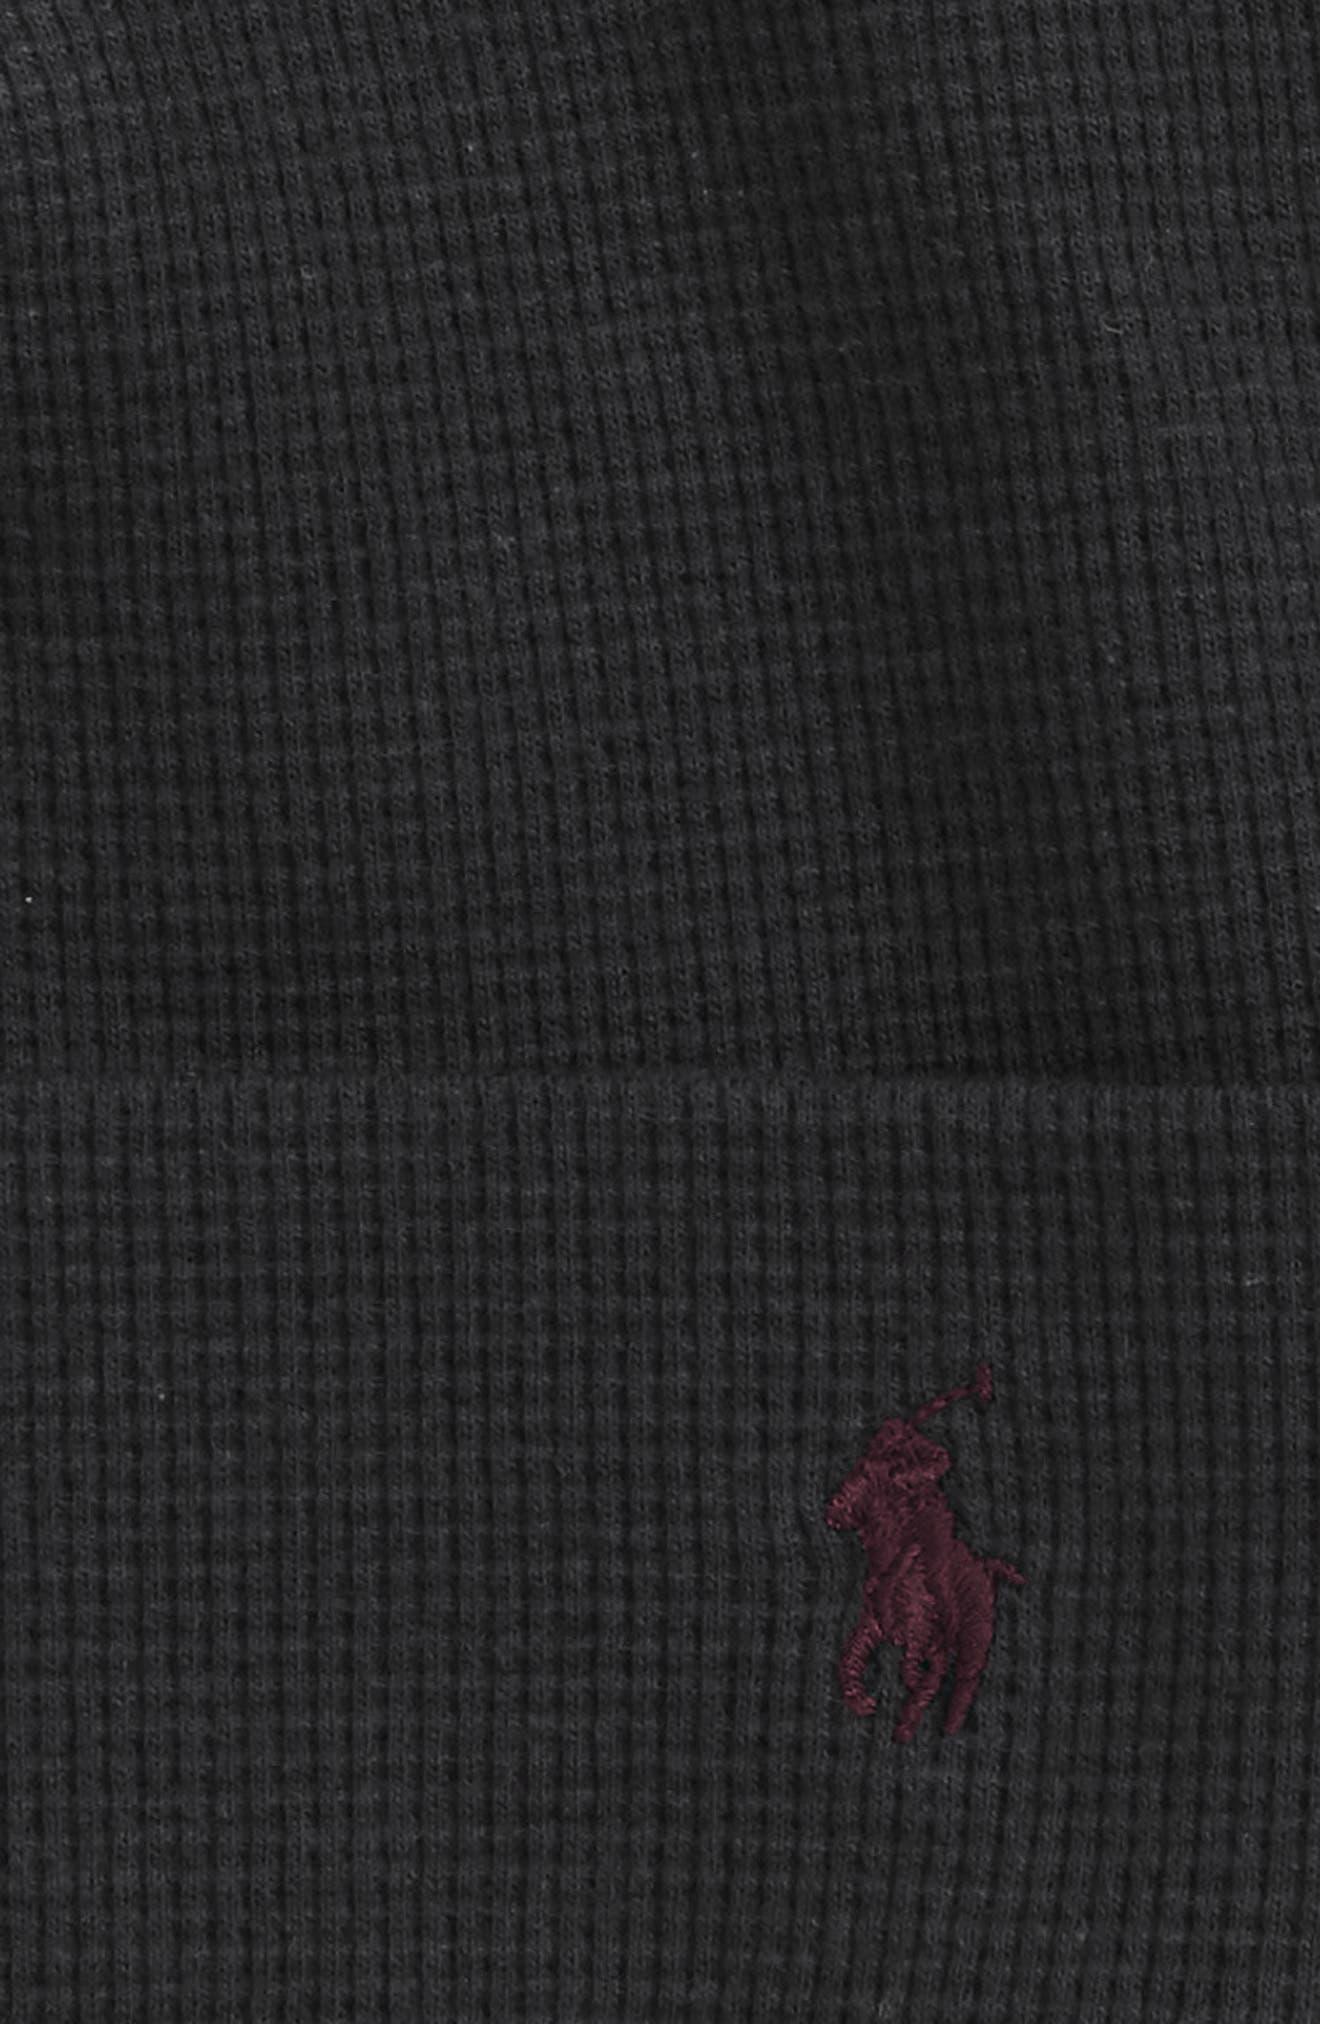 Thermal Cuff Cotton Cap,                             Alternate thumbnail 3, color,                             001